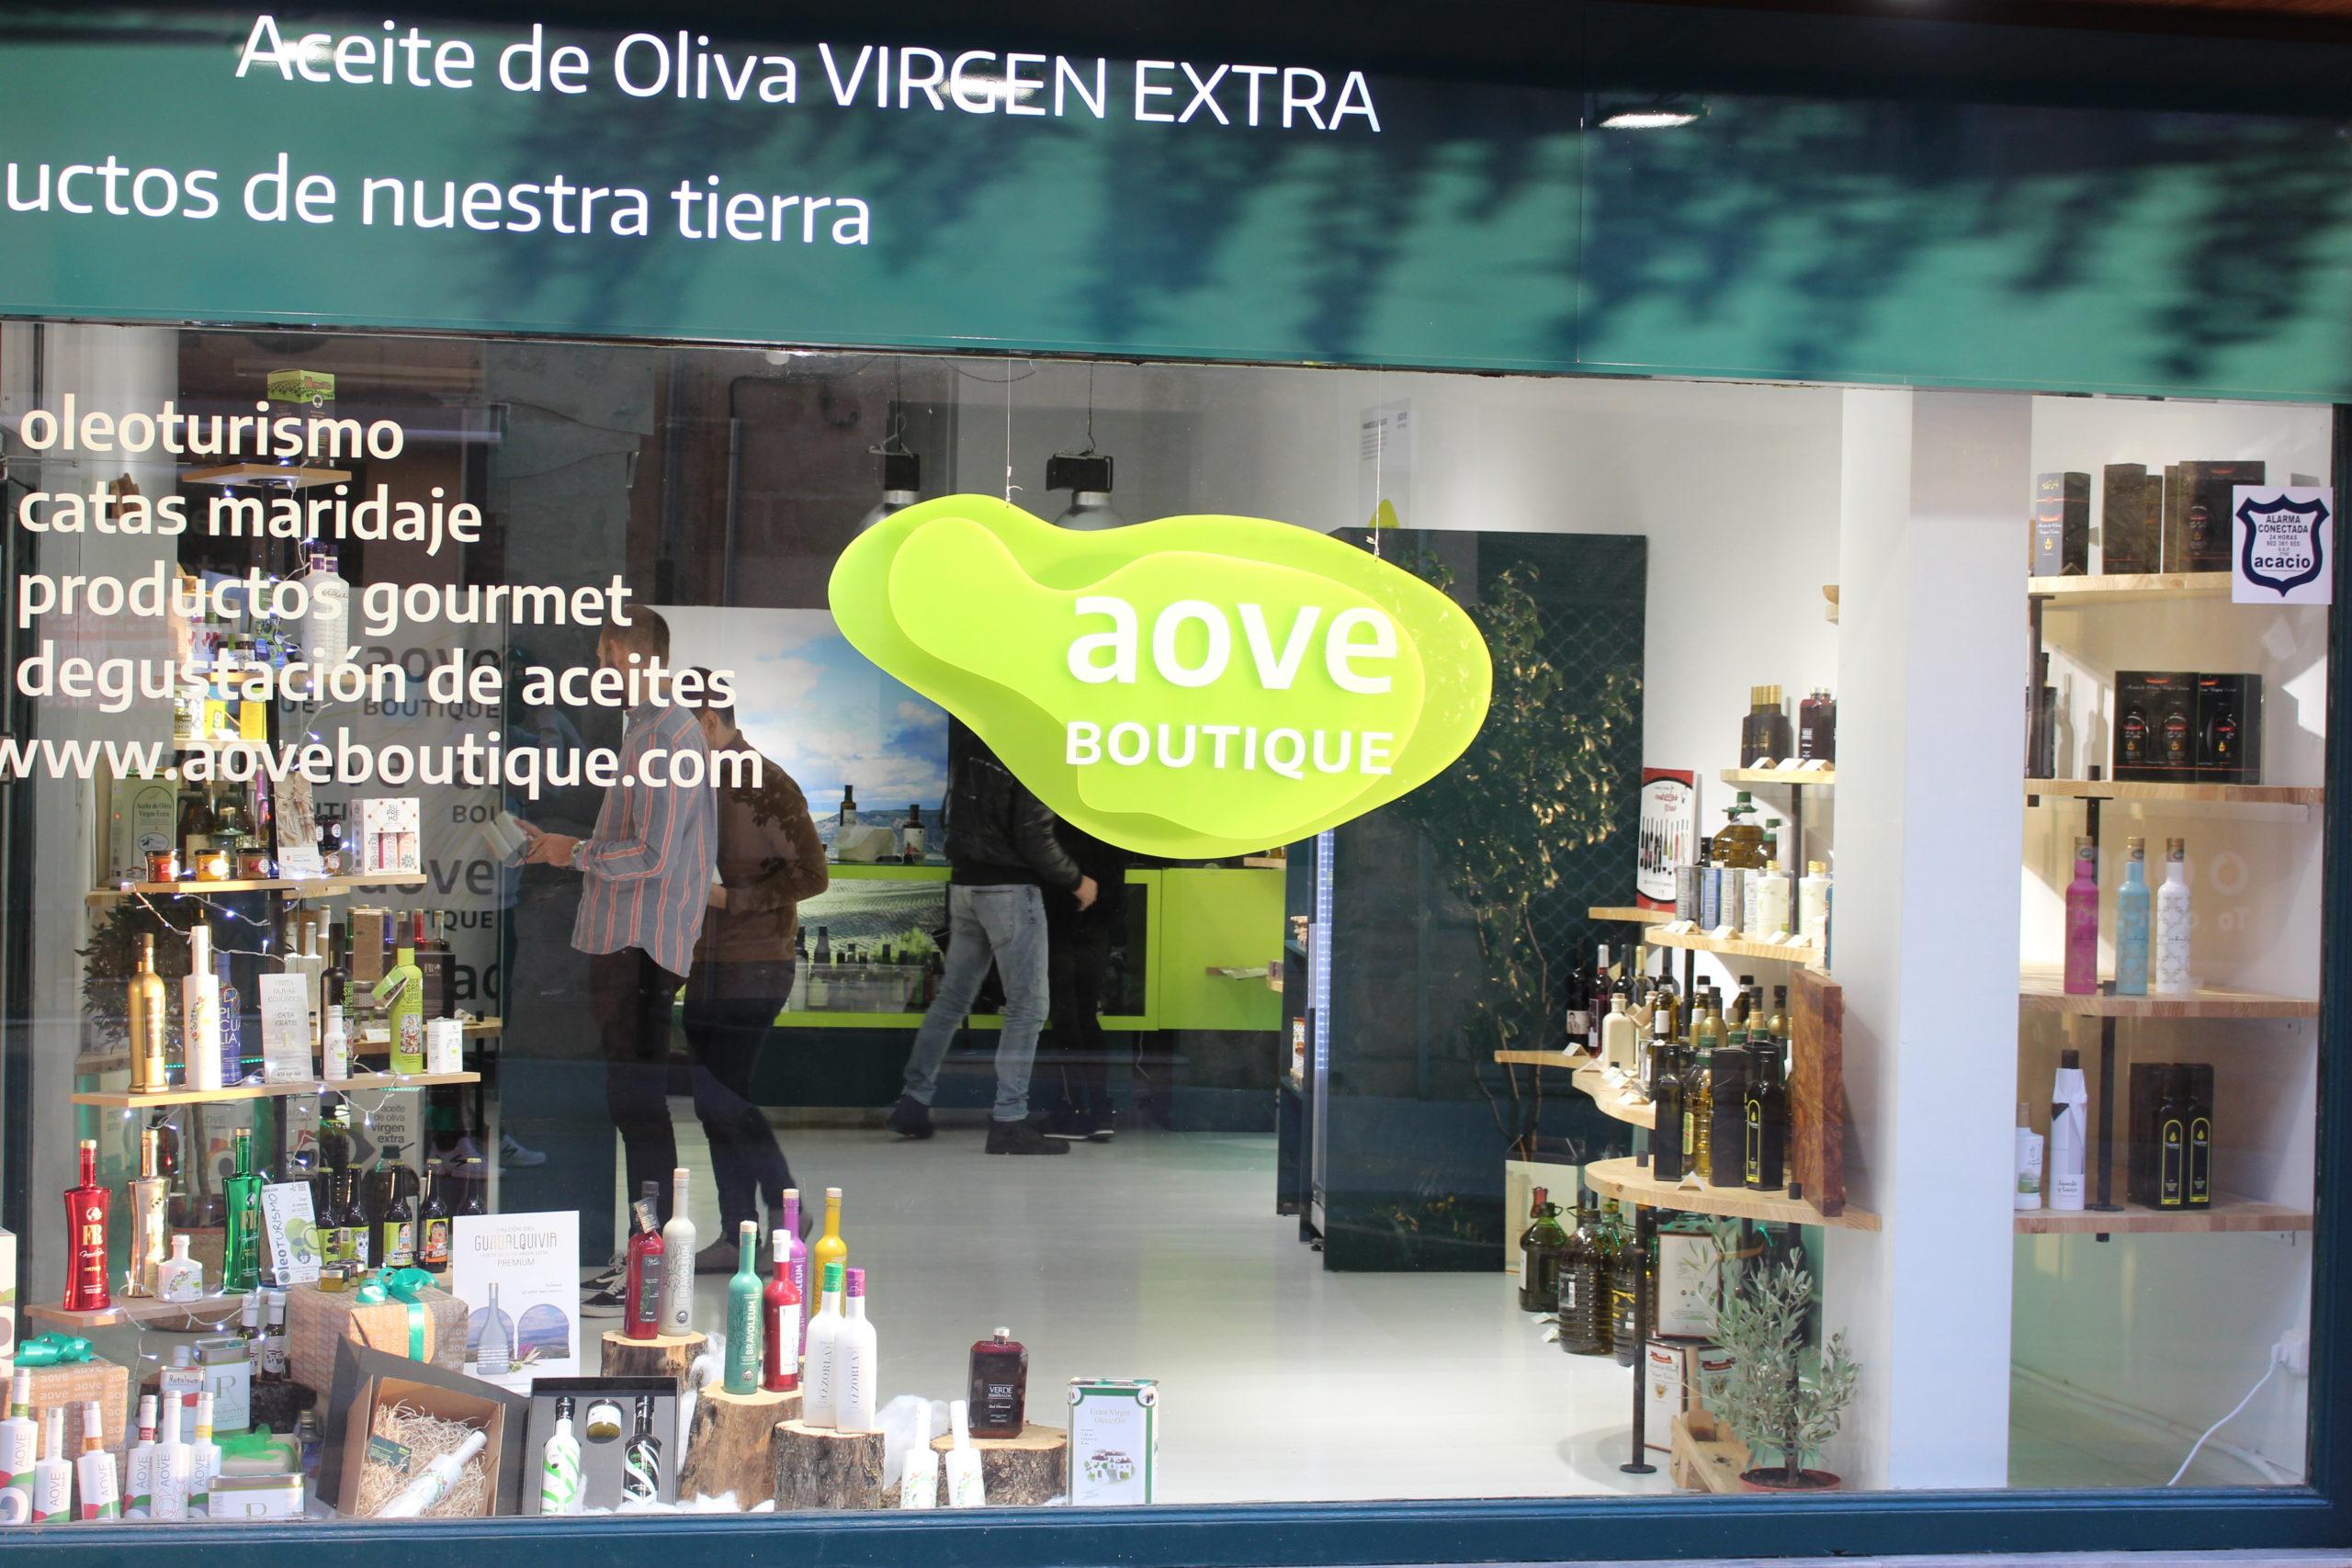 Aove Boutique